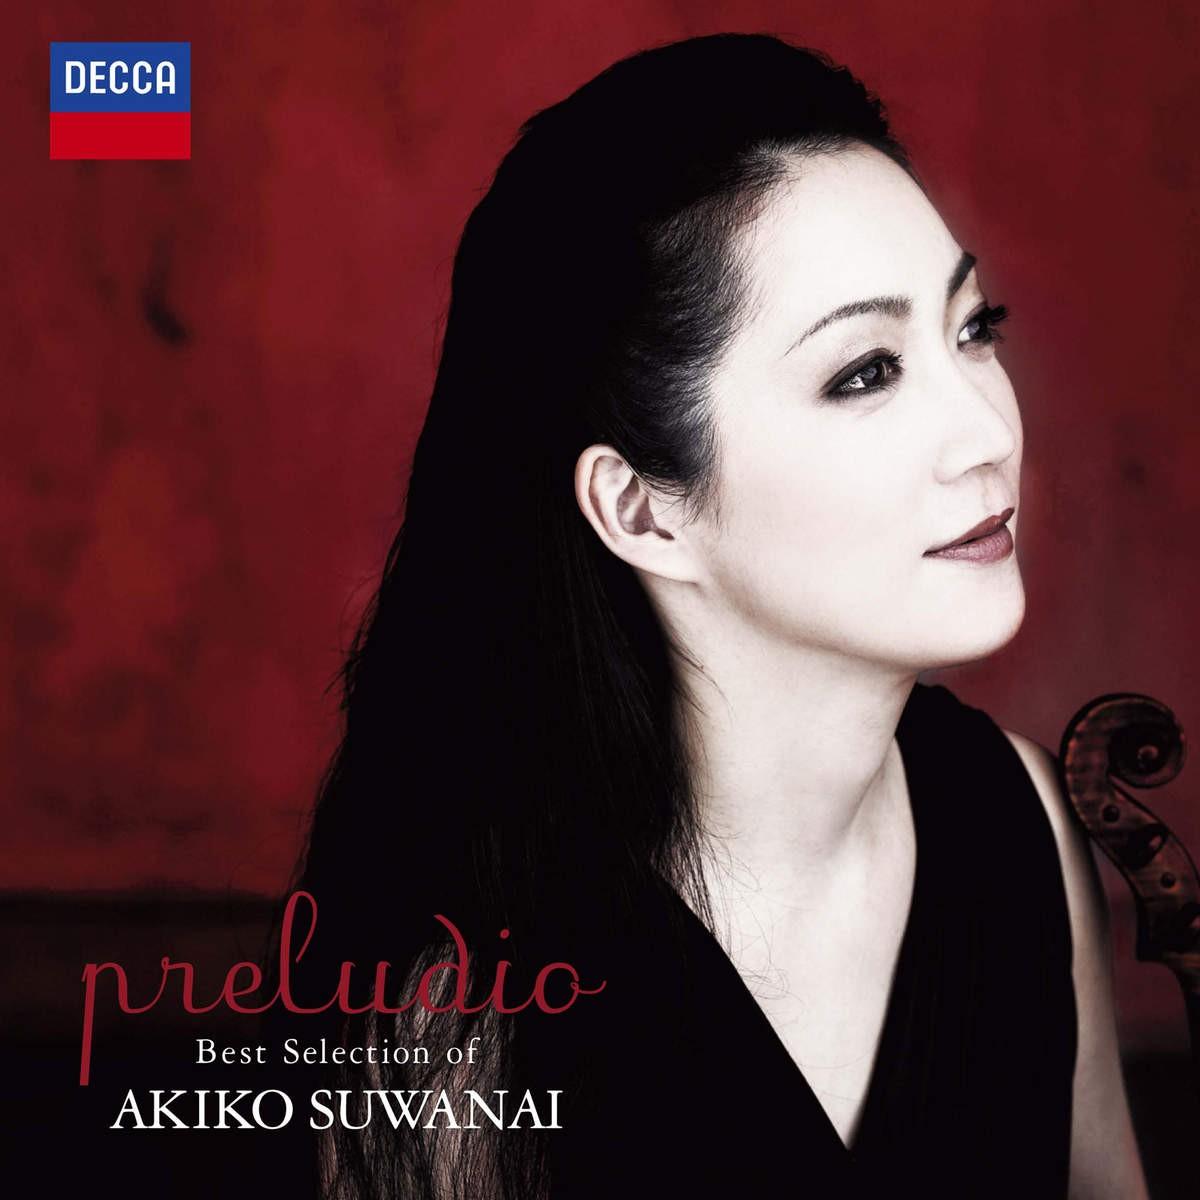 preludio  ~Best Selection of AKIKO SUWANAI~ - Akiko Suwanai